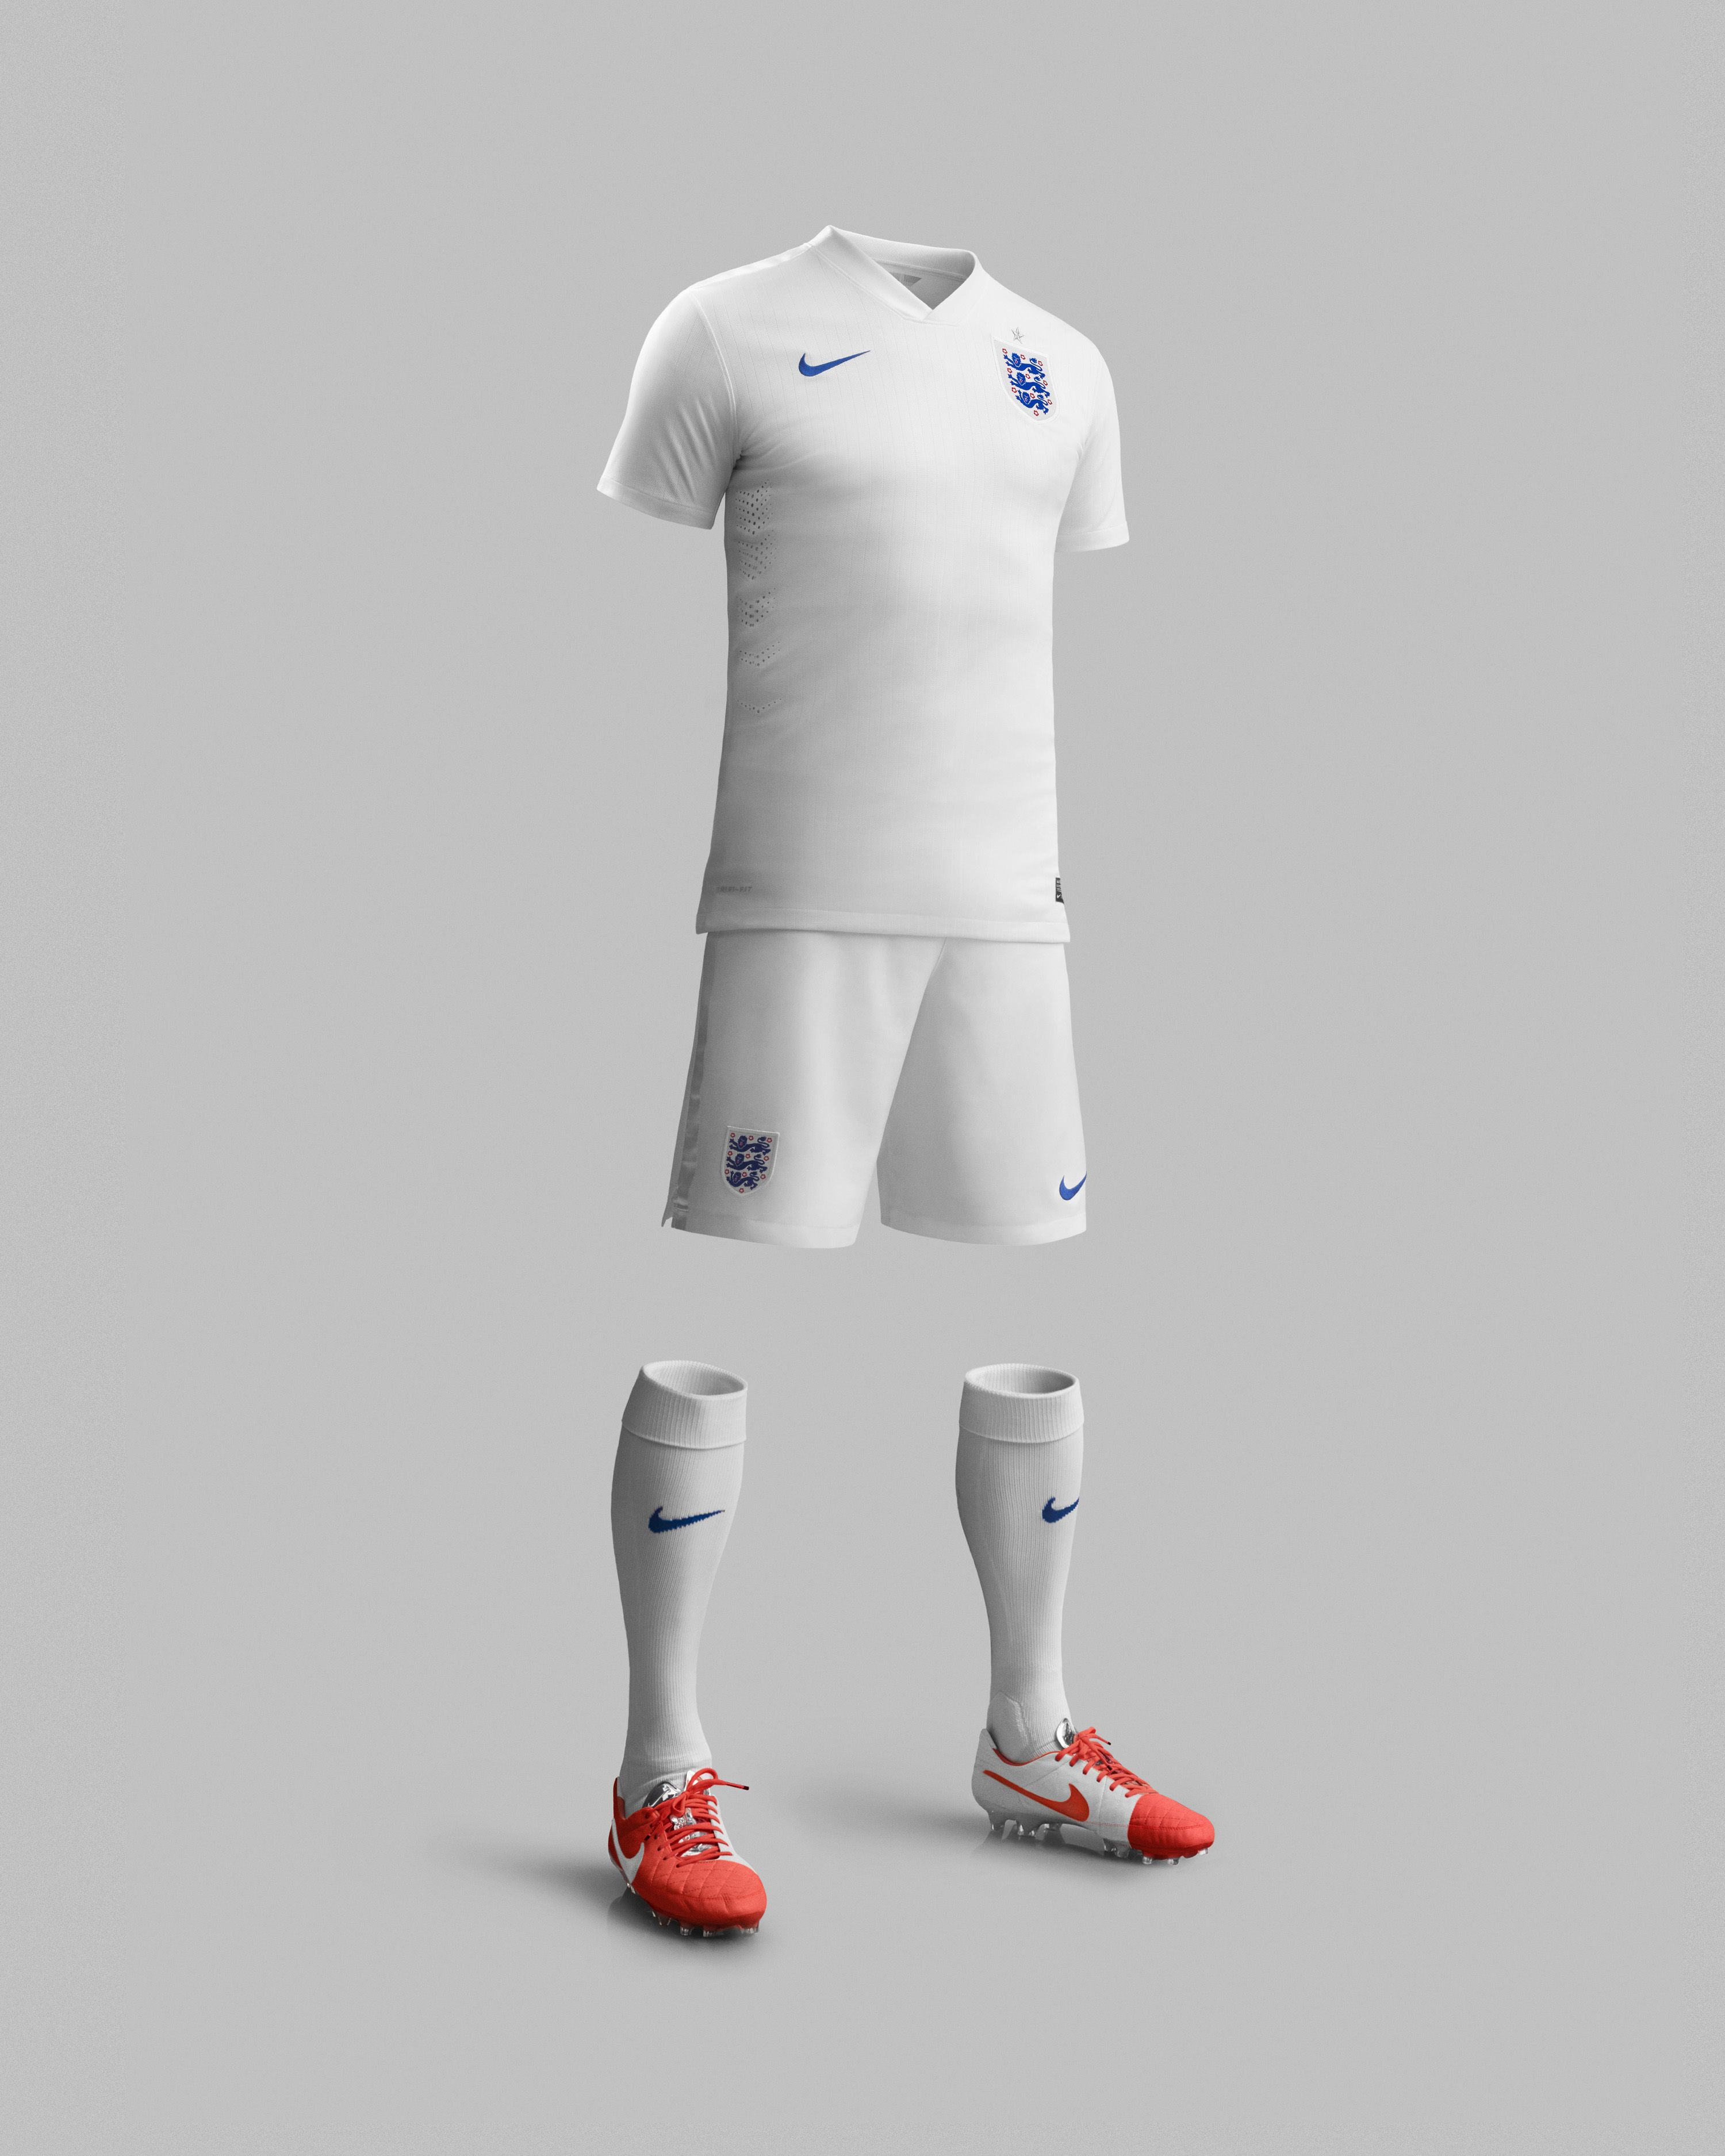 T shirt white psd - Football Kits